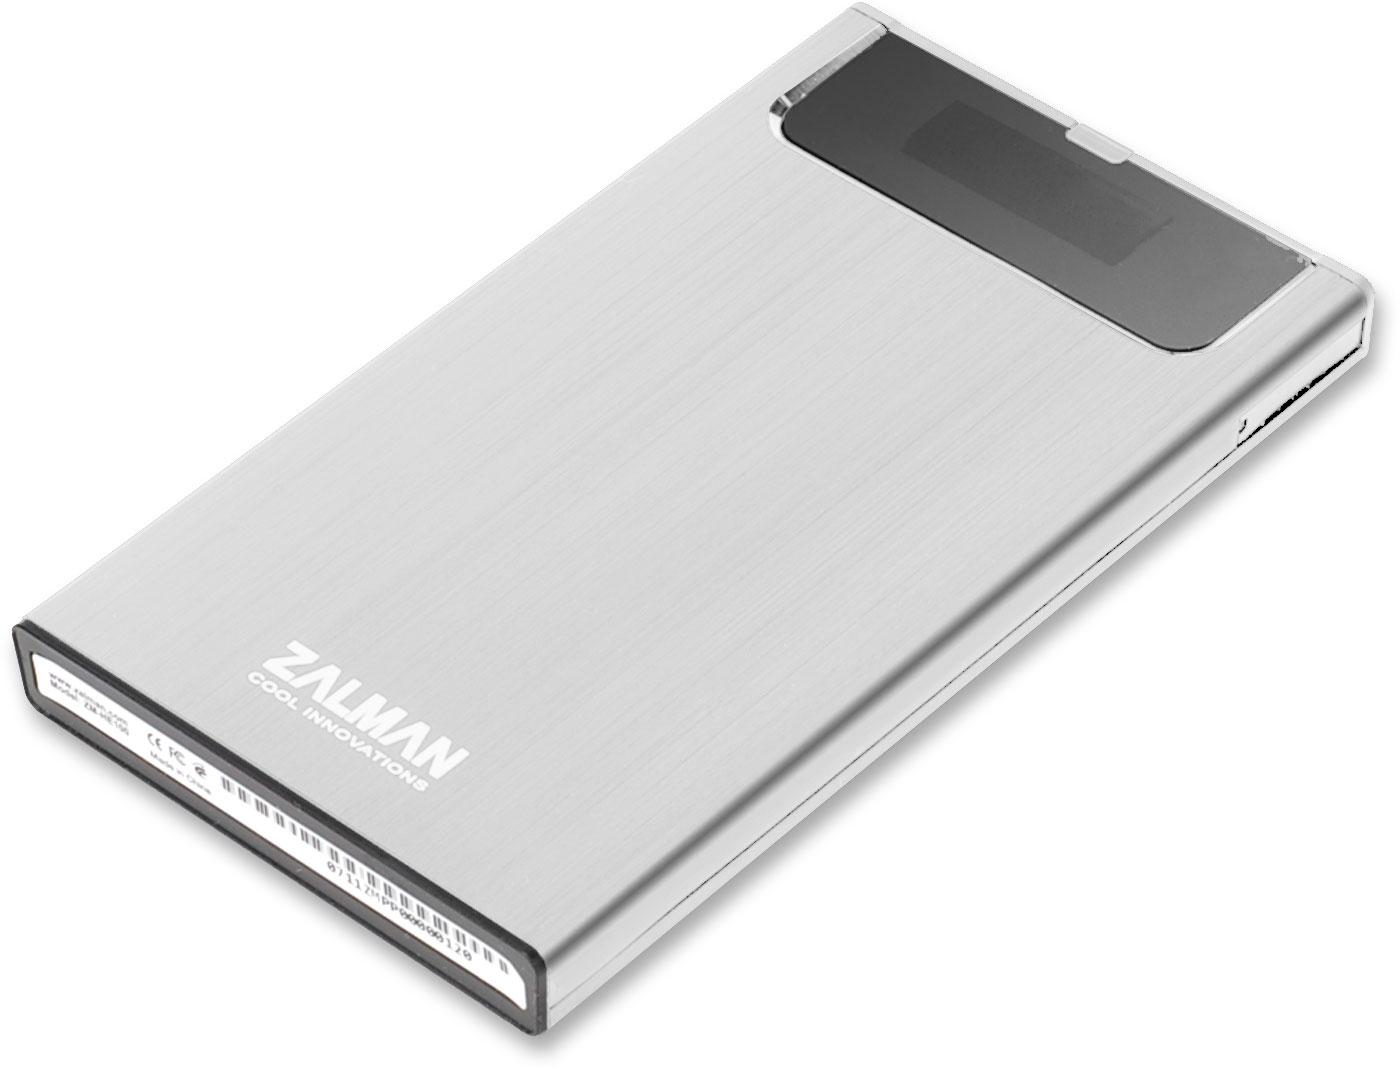 ZALMAN ZM-HE130 EXTERNAL HDD WINDOWS 7 DRIVERS DOWNLOAD